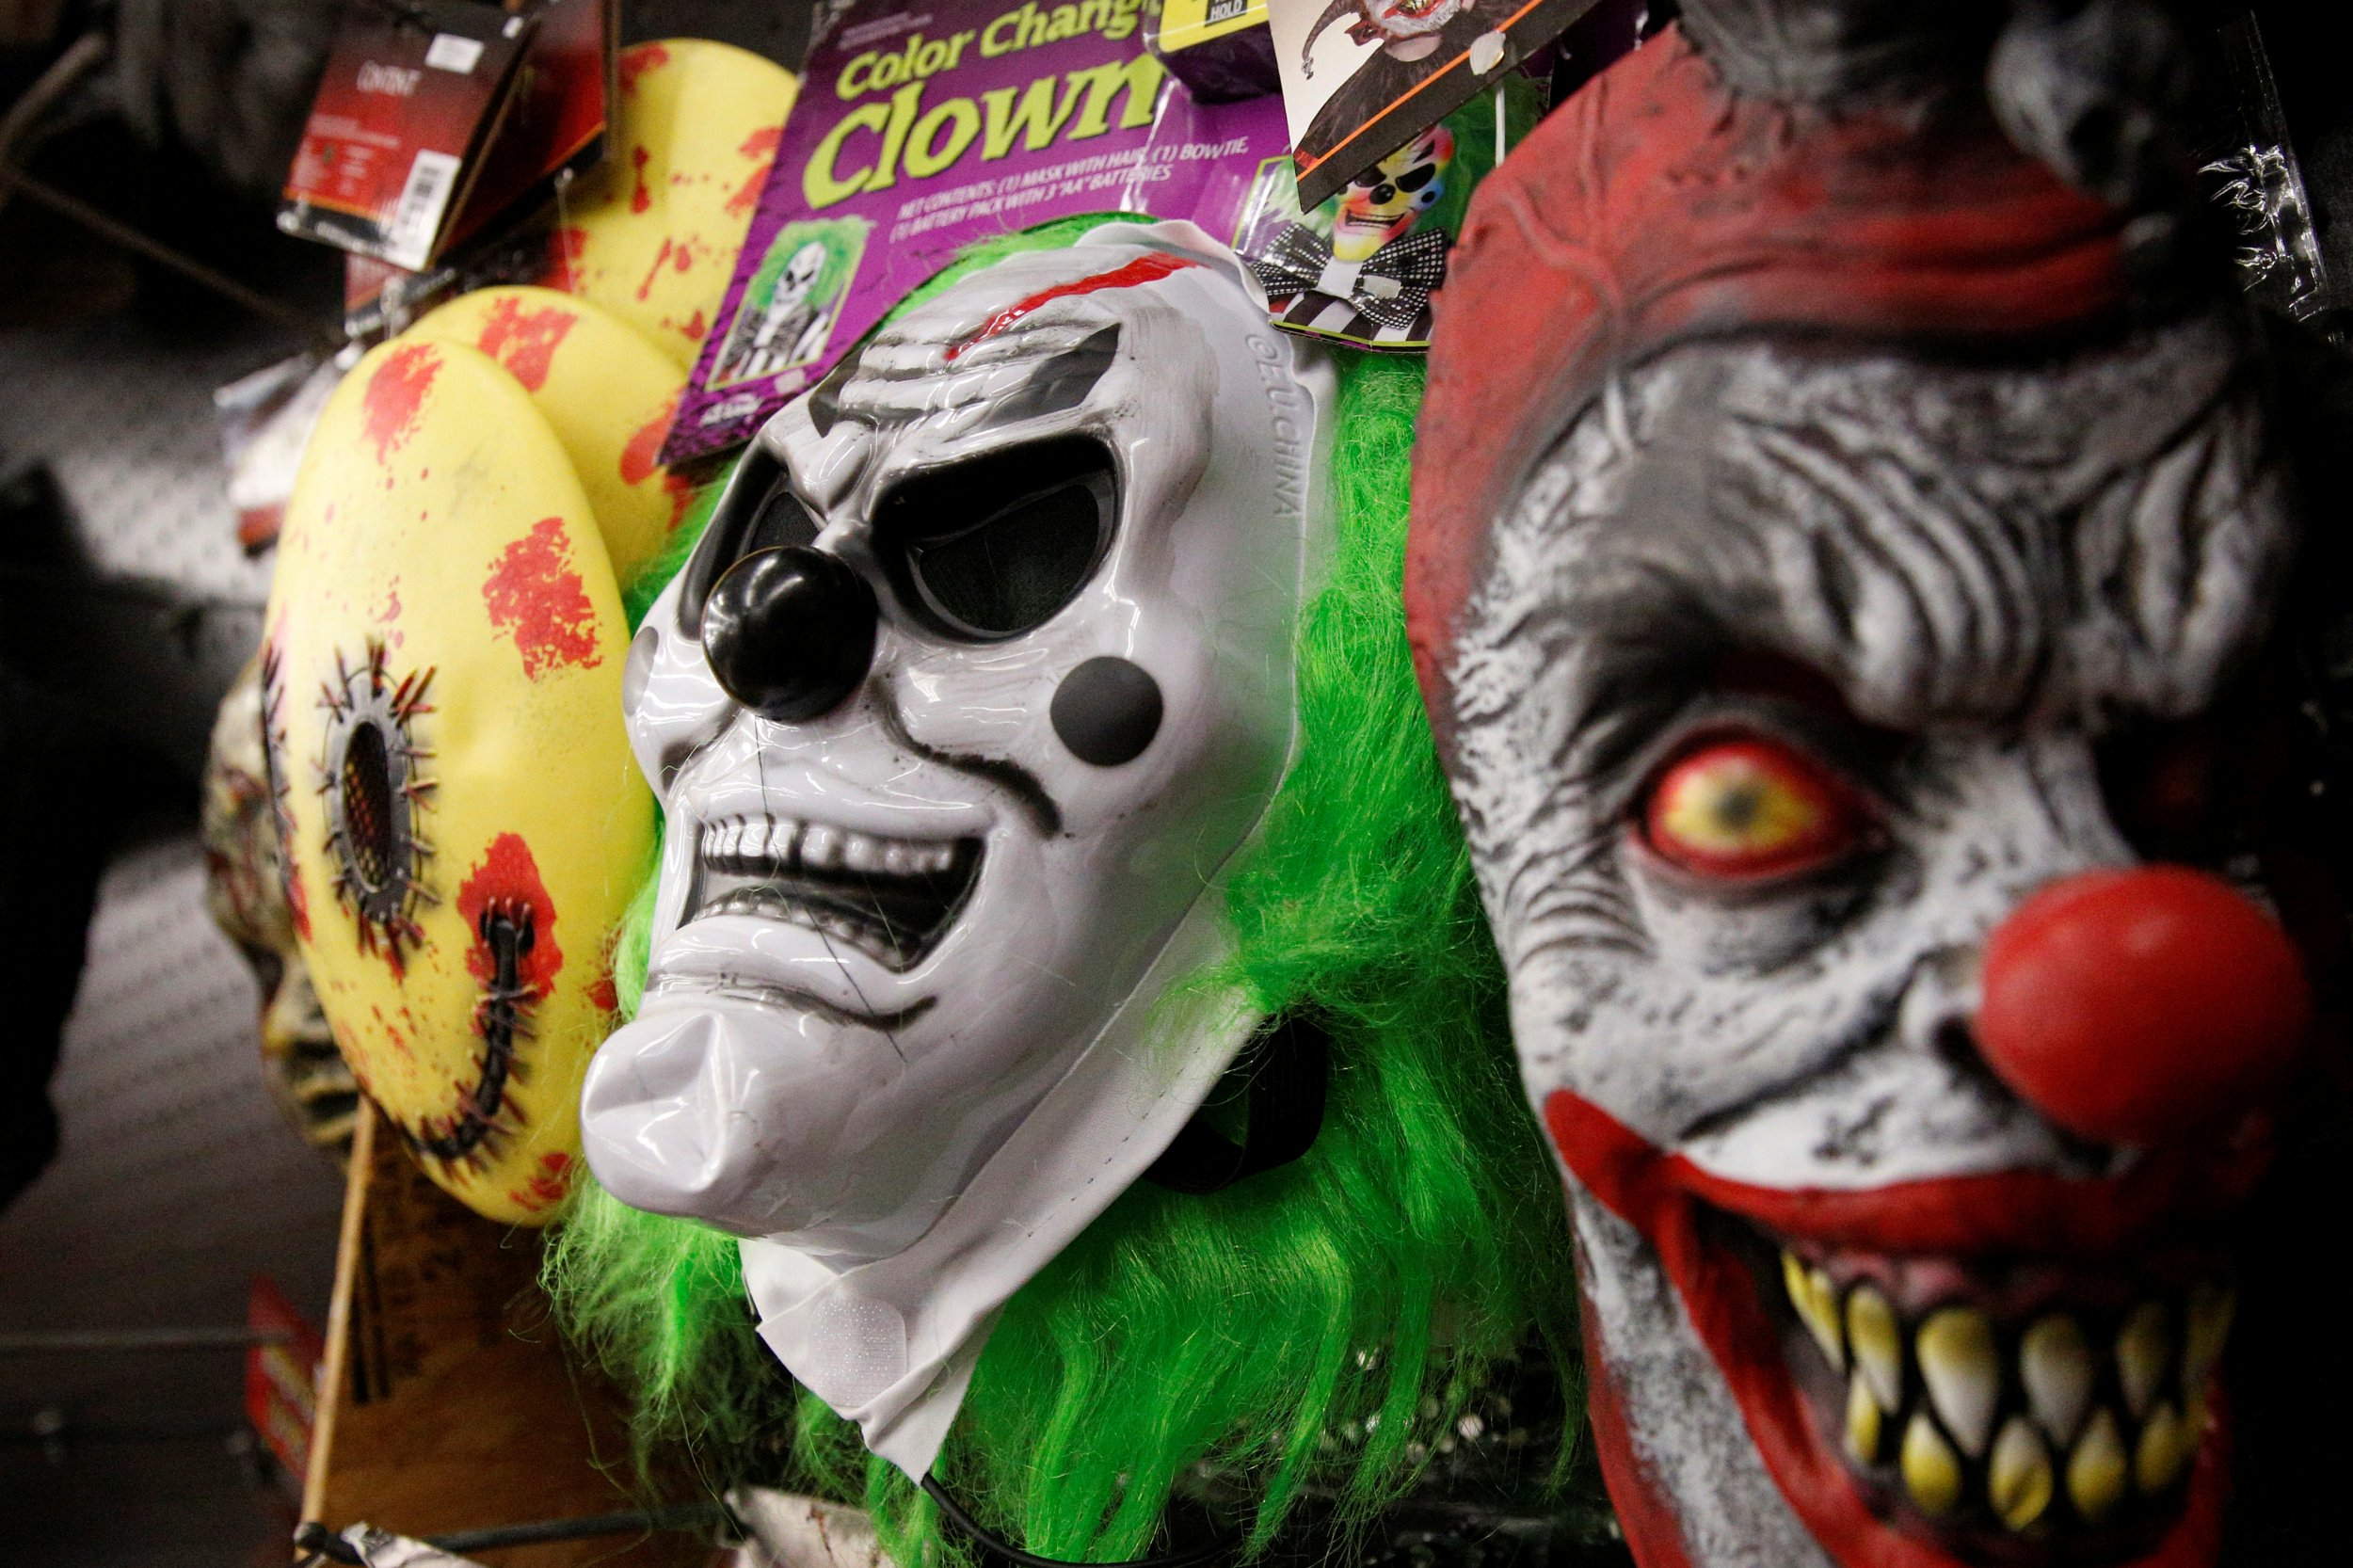 Creepy Clown Sightings Could Return in 2017, Pennsylvania